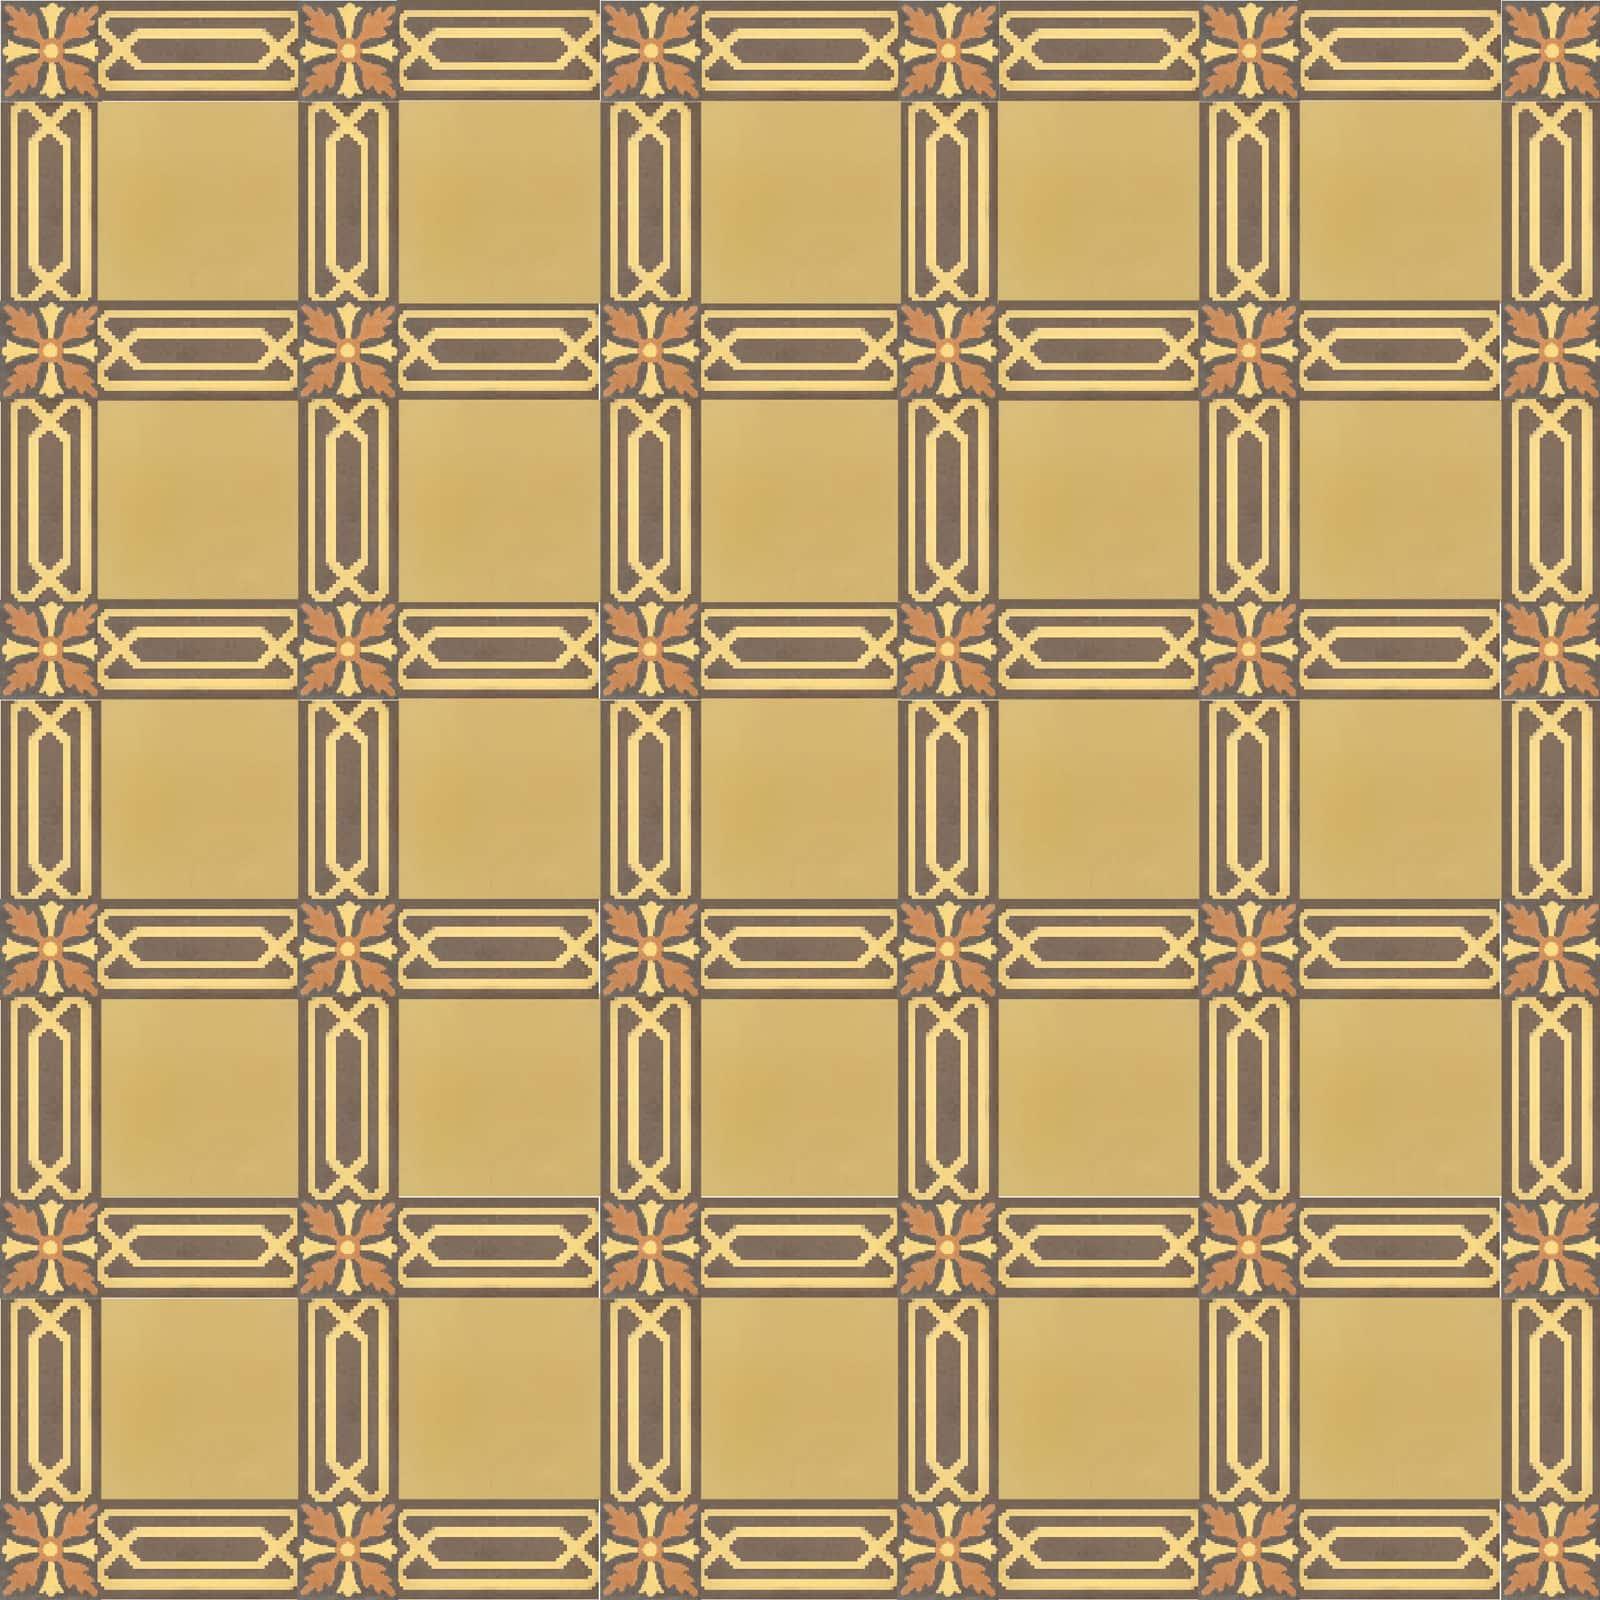 zementfliesen-terrazzofliesen-kreidefarbe-terrazzo-fugenlos-viaplatten-52030   53030/70